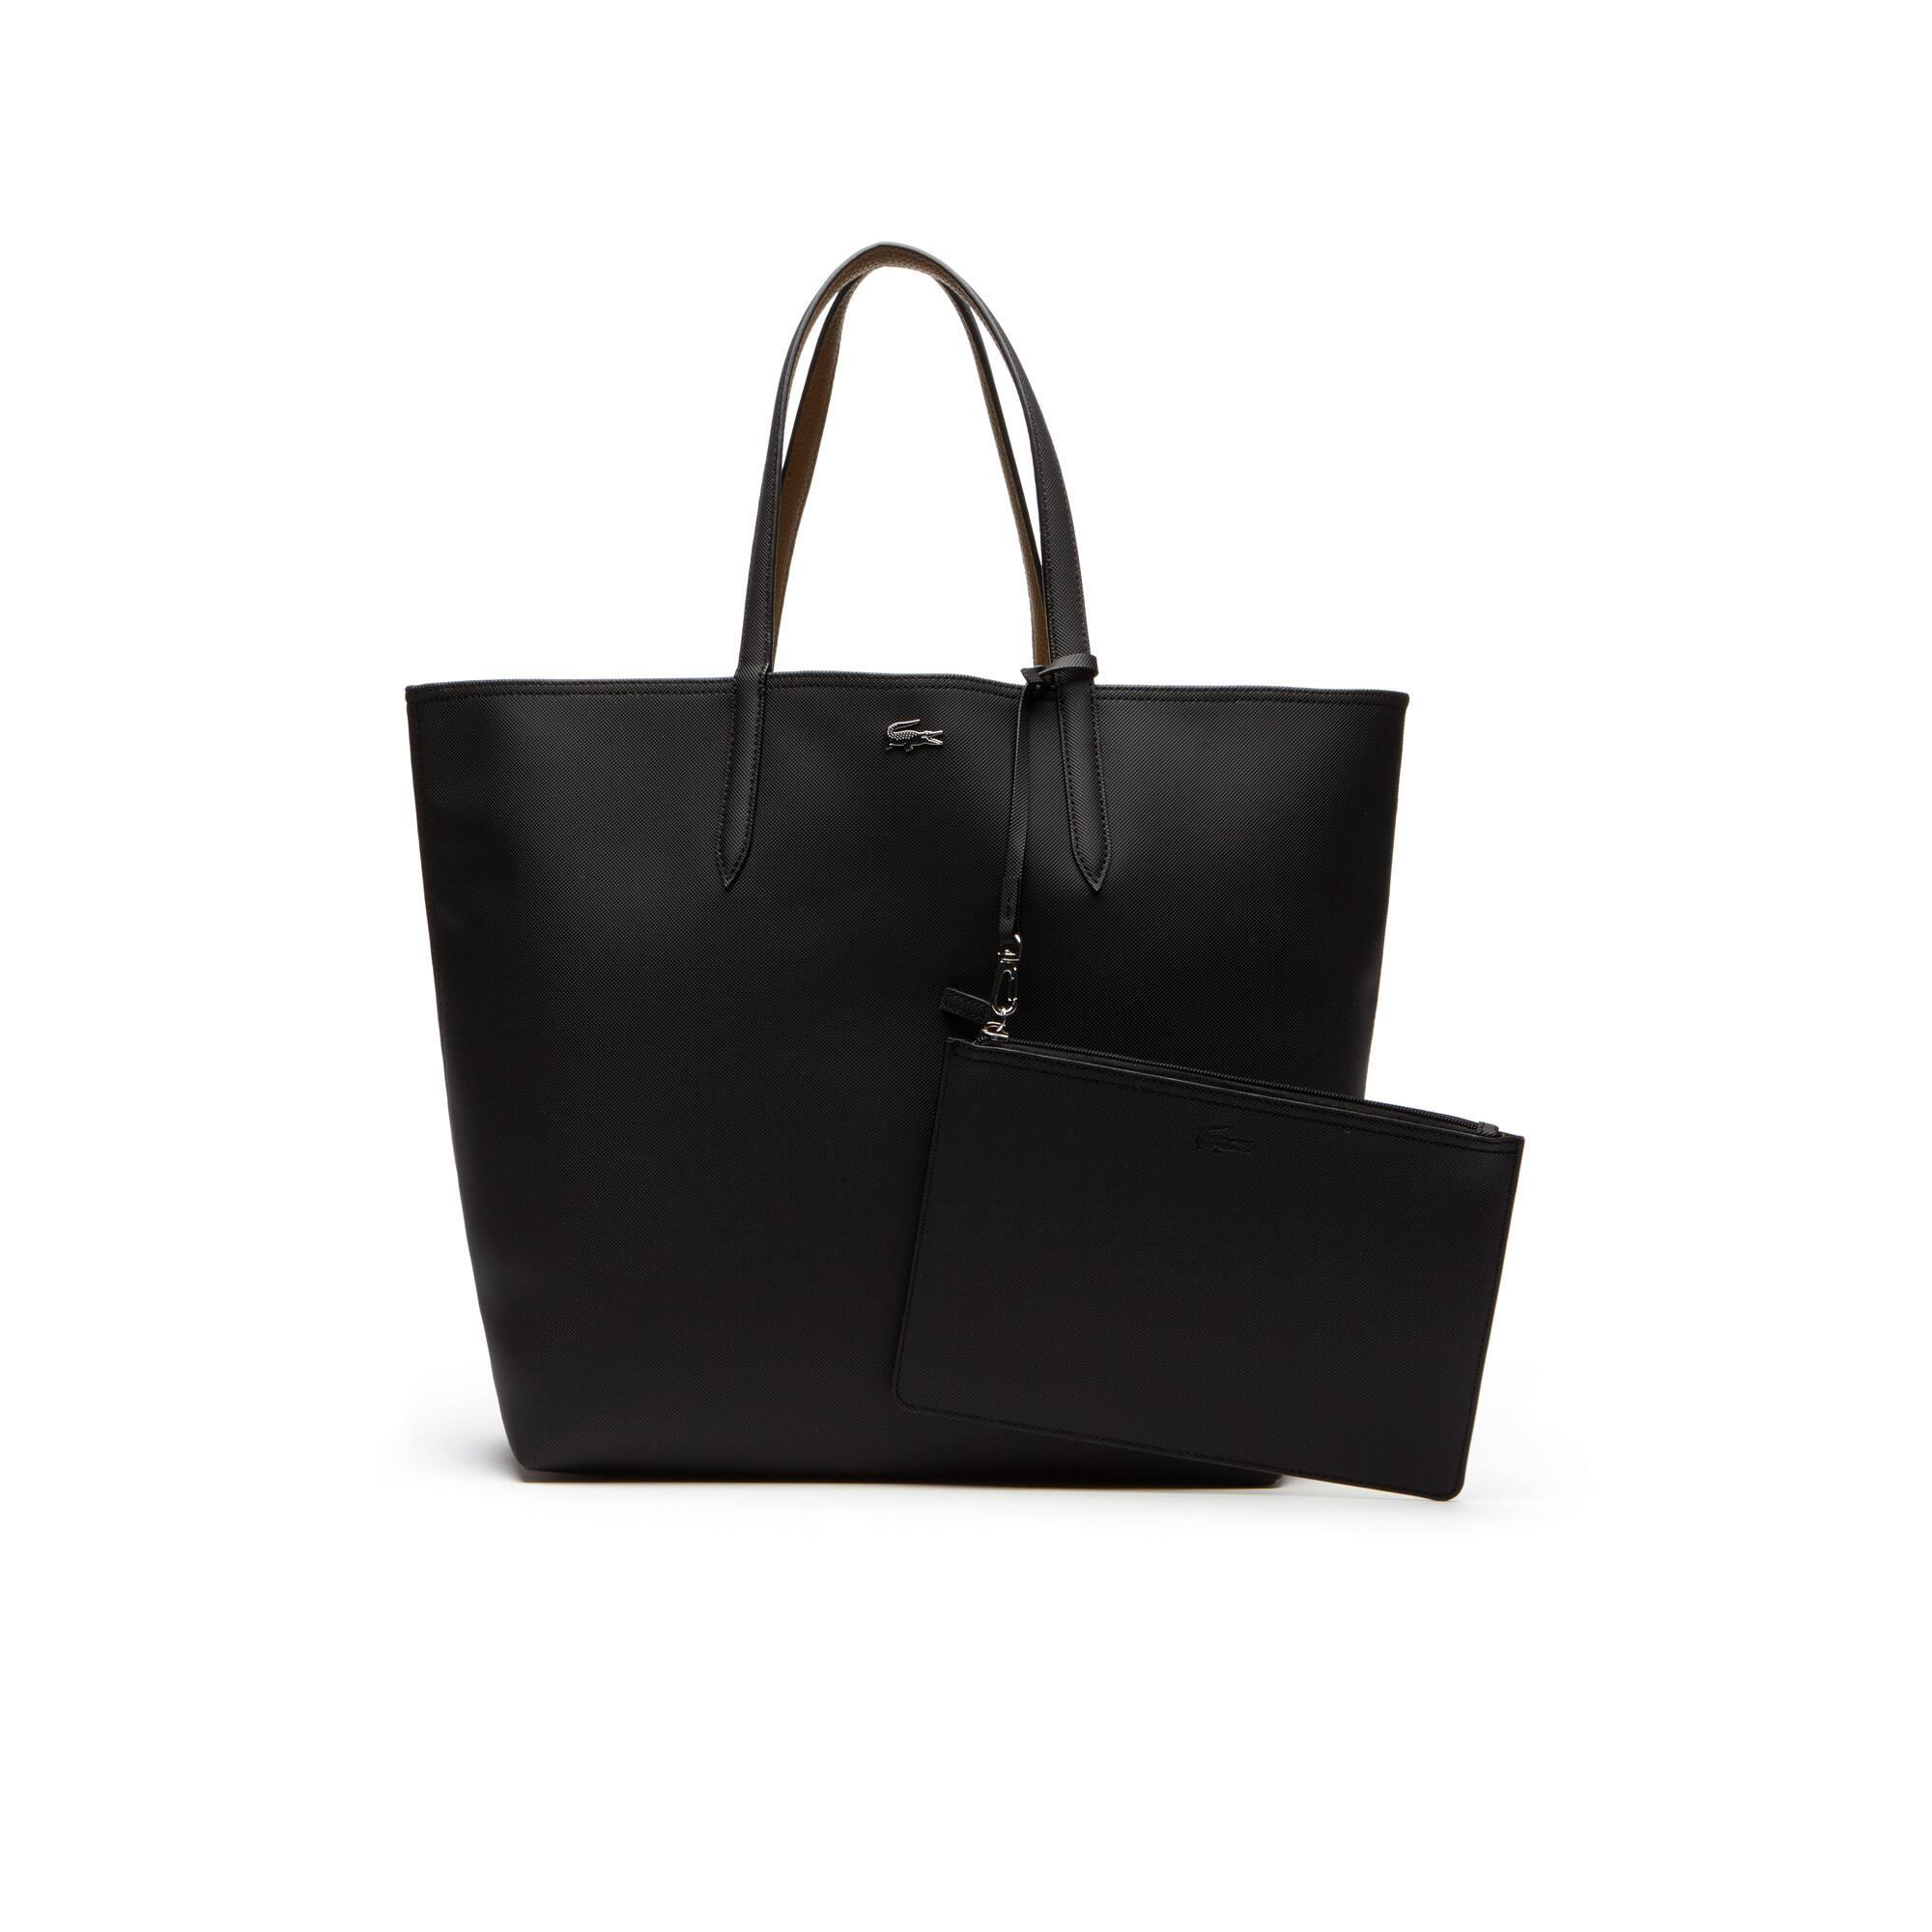 Grande shopping bag Anna reversibile bicolore